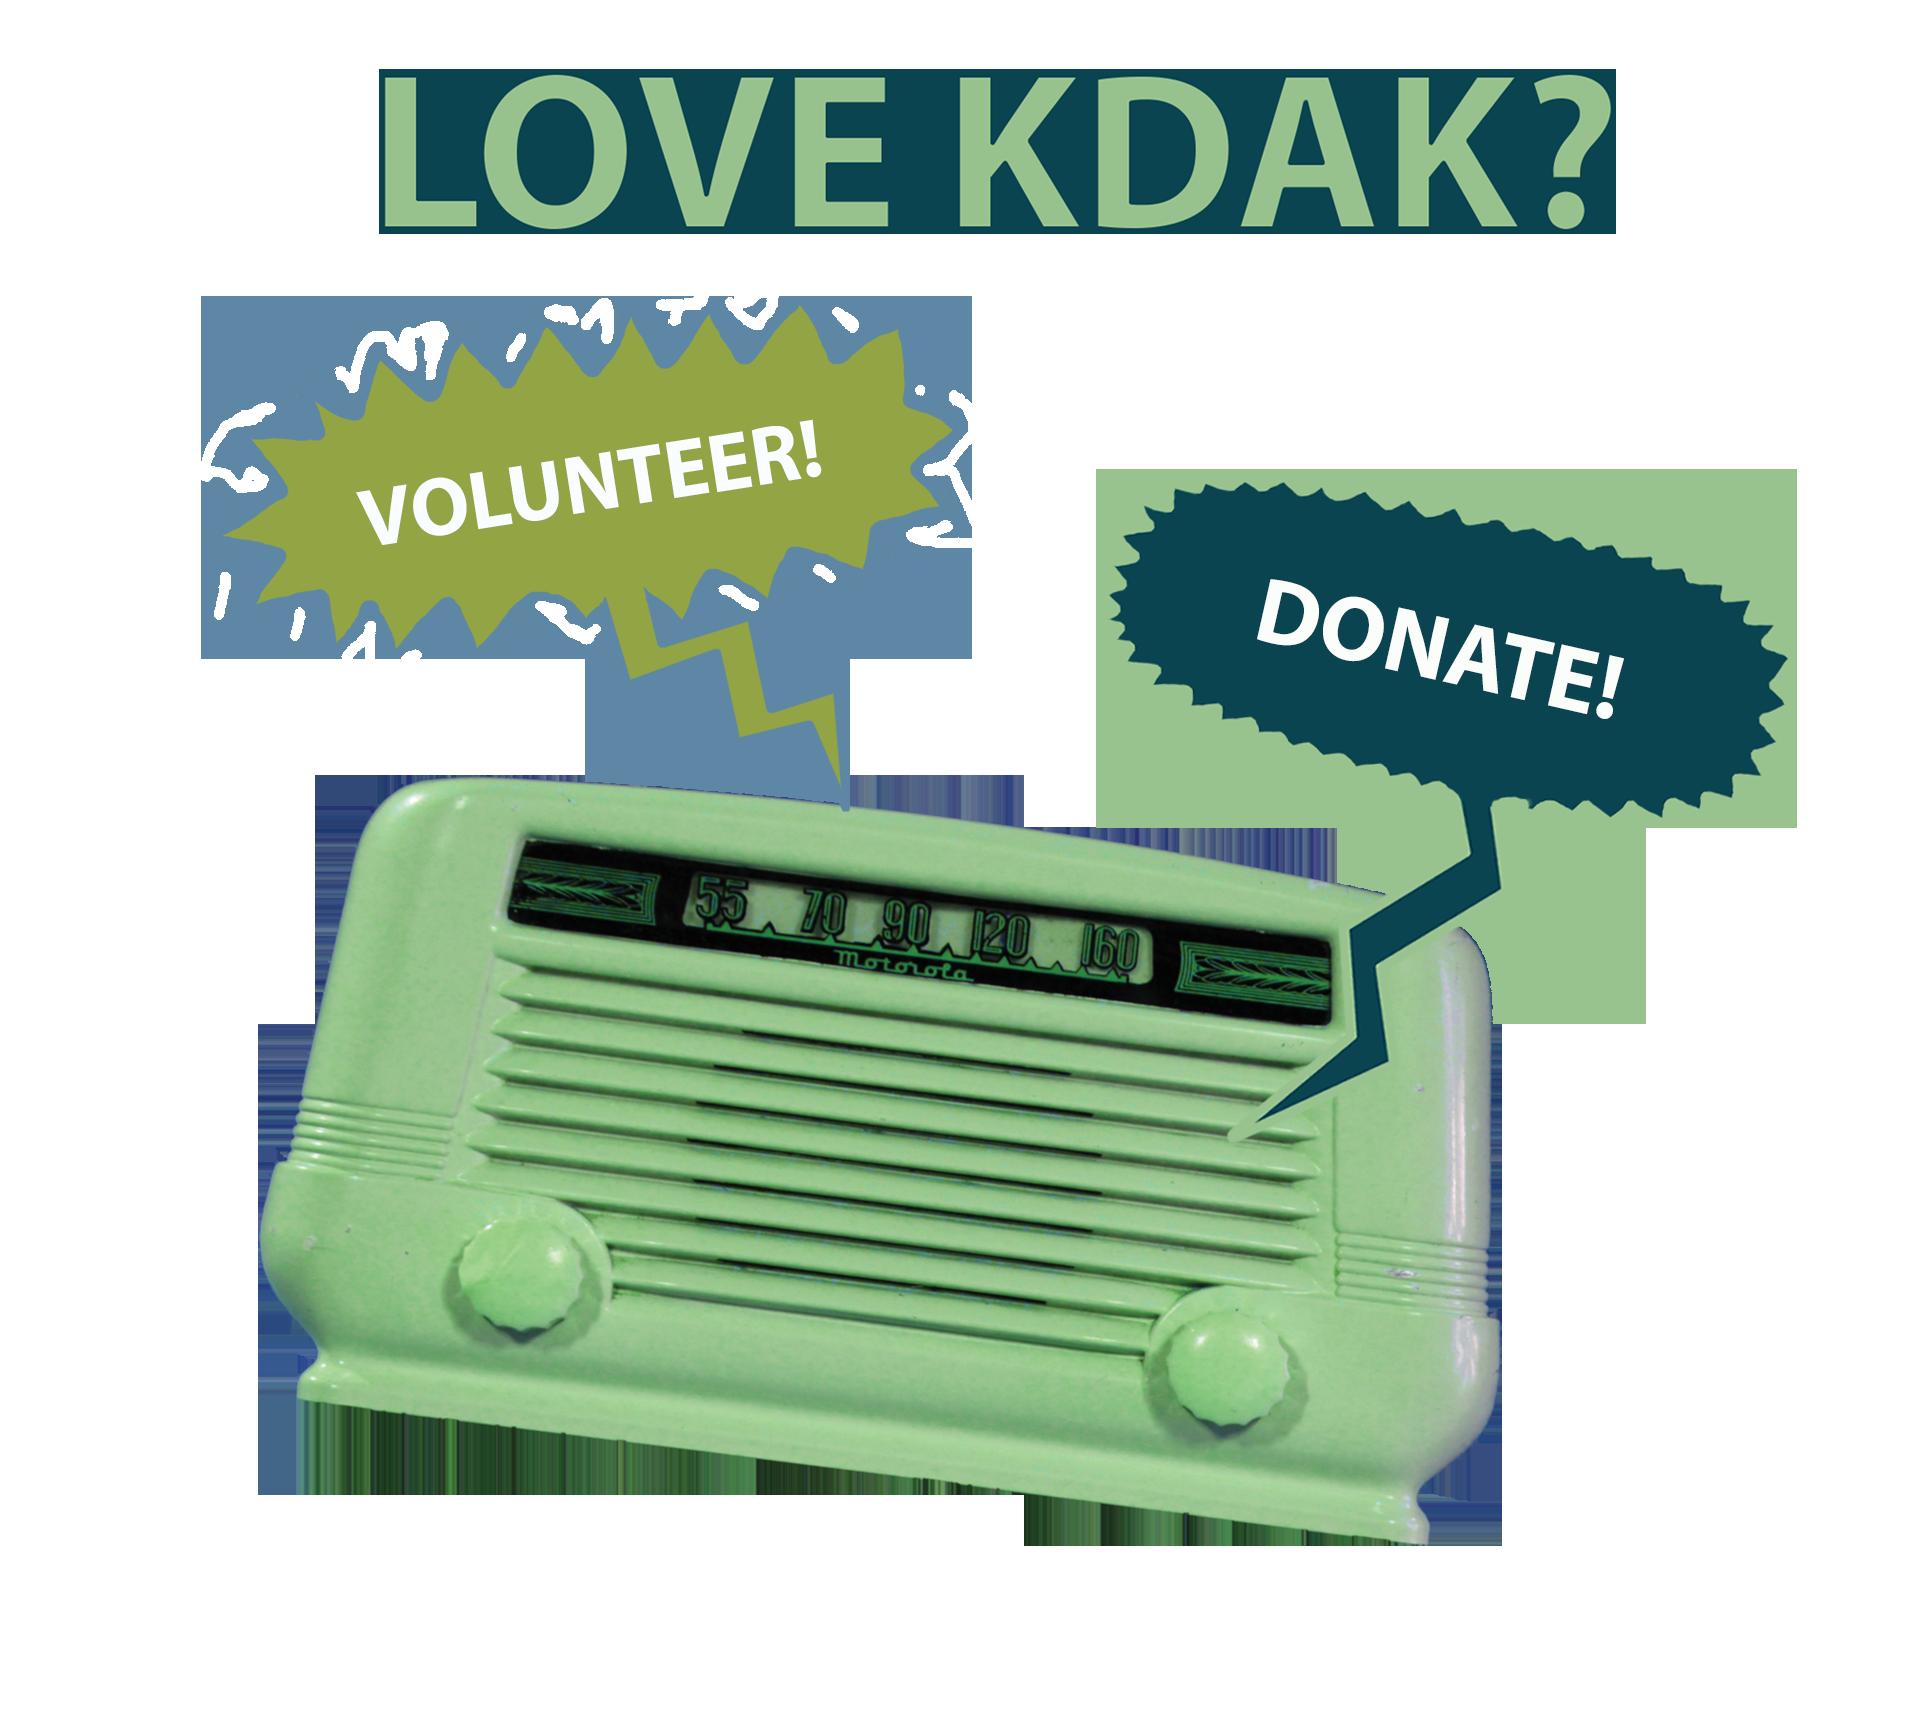 Volunteer & Donate